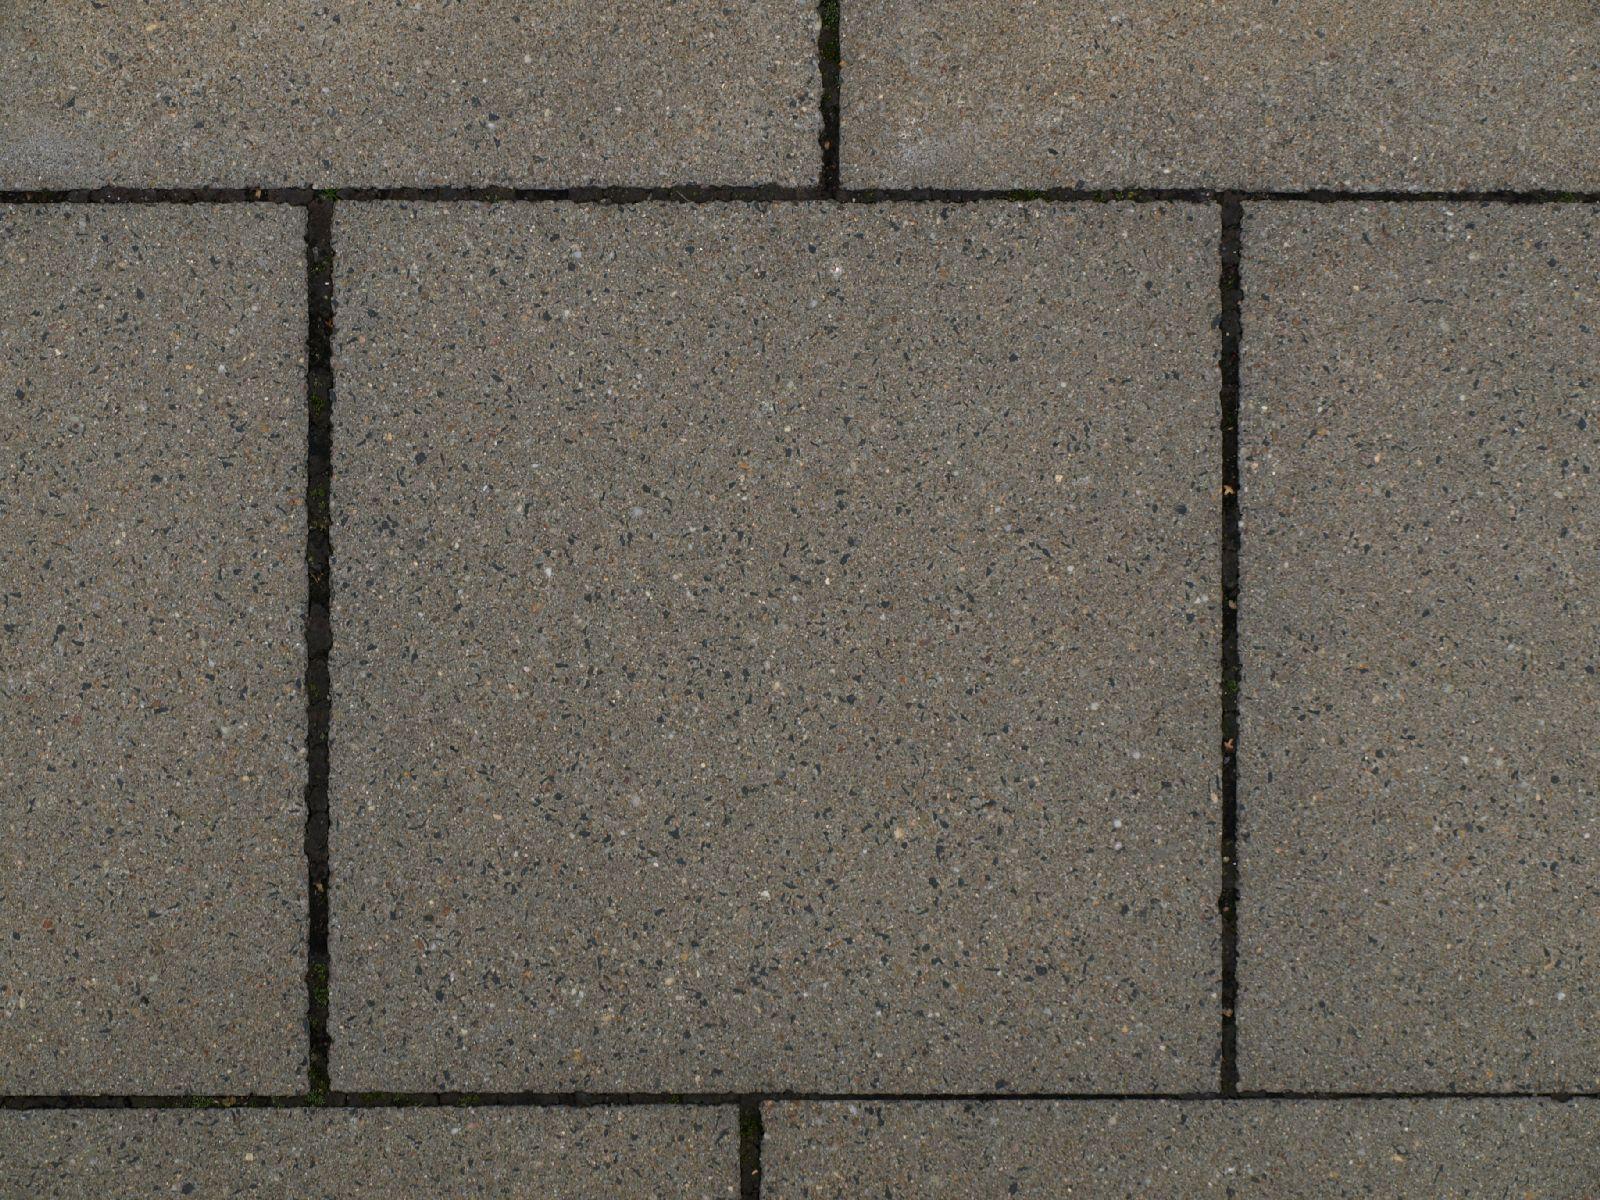 Boden-Gehweg-Strasse-Buergersteig-Textur_A_PA045714